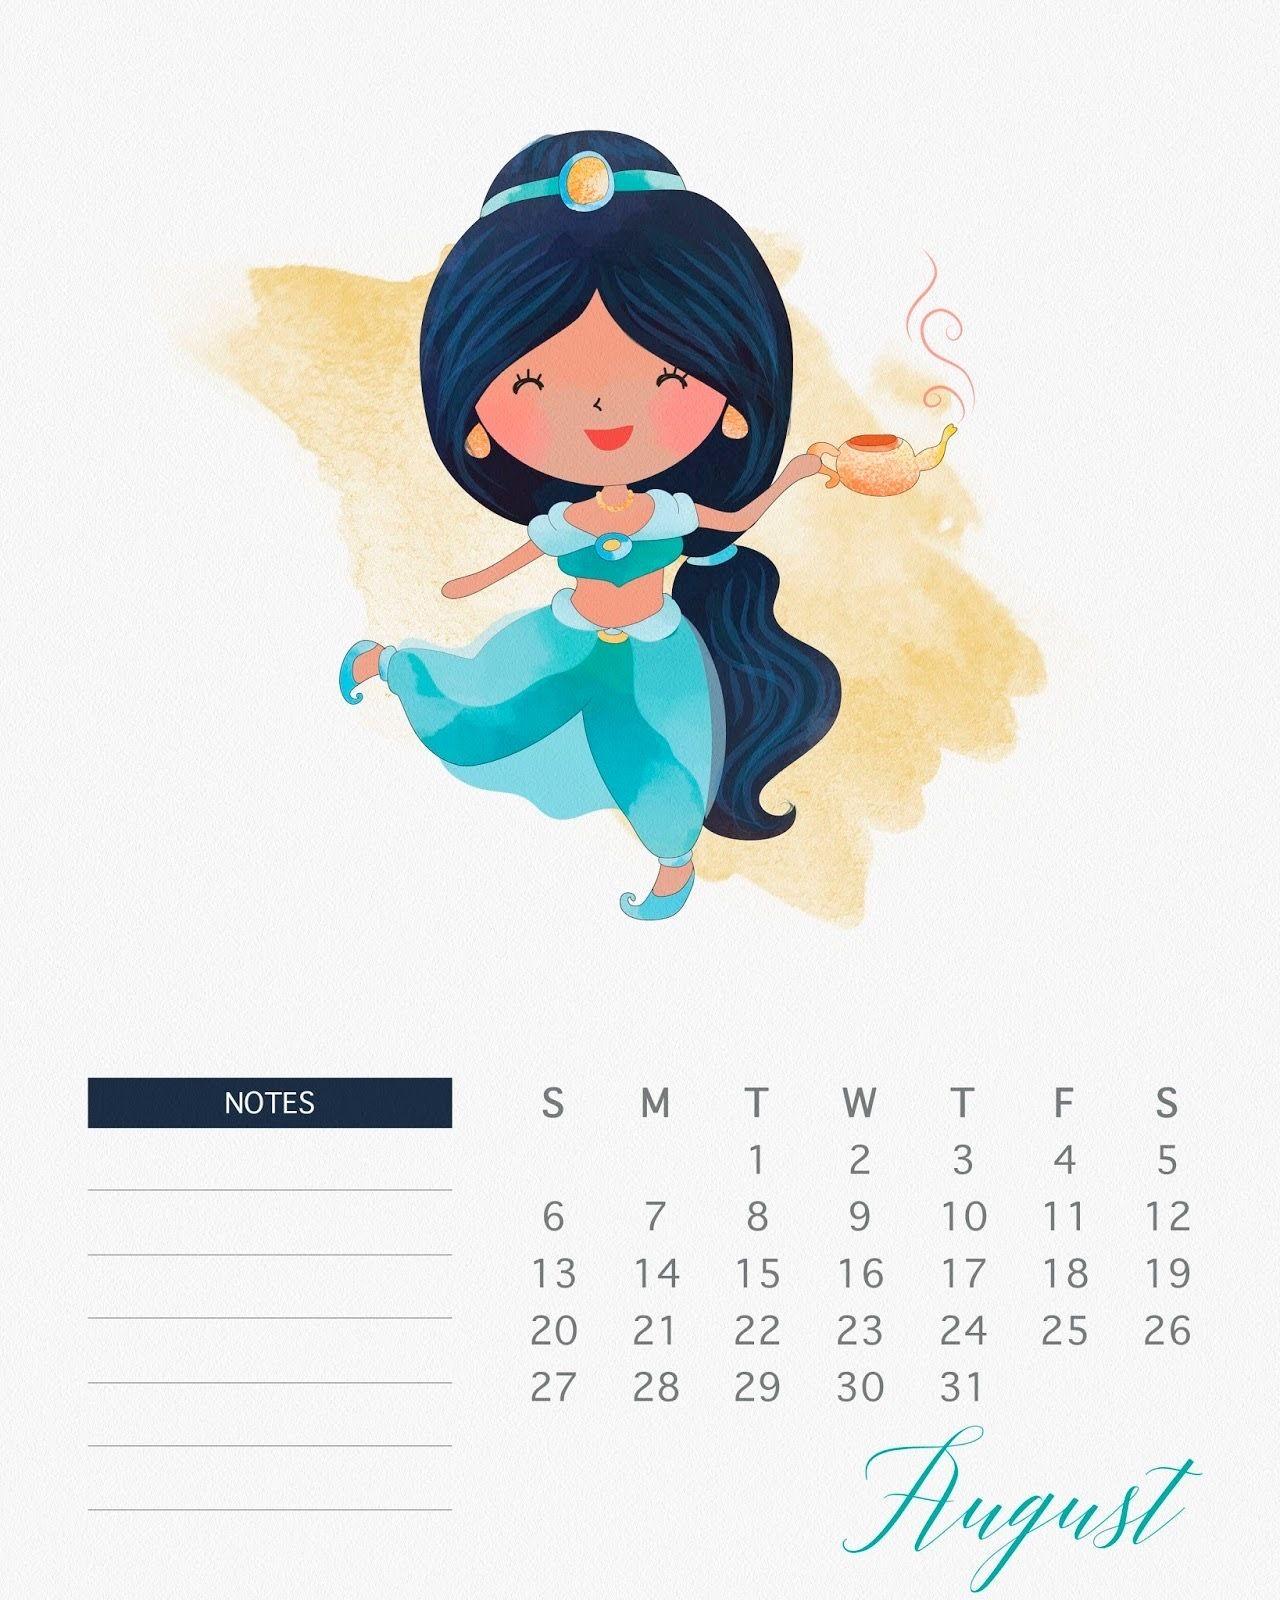 Calendario De Outubro 2017 Para Imprimir Más Actual Pin De Ana Rodriguez En Planificador Mensual Imprimible Of Calendario De Outubro 2017 Para Imprimir Más Caliente Pin De Flora Las Em Printable Pinterest